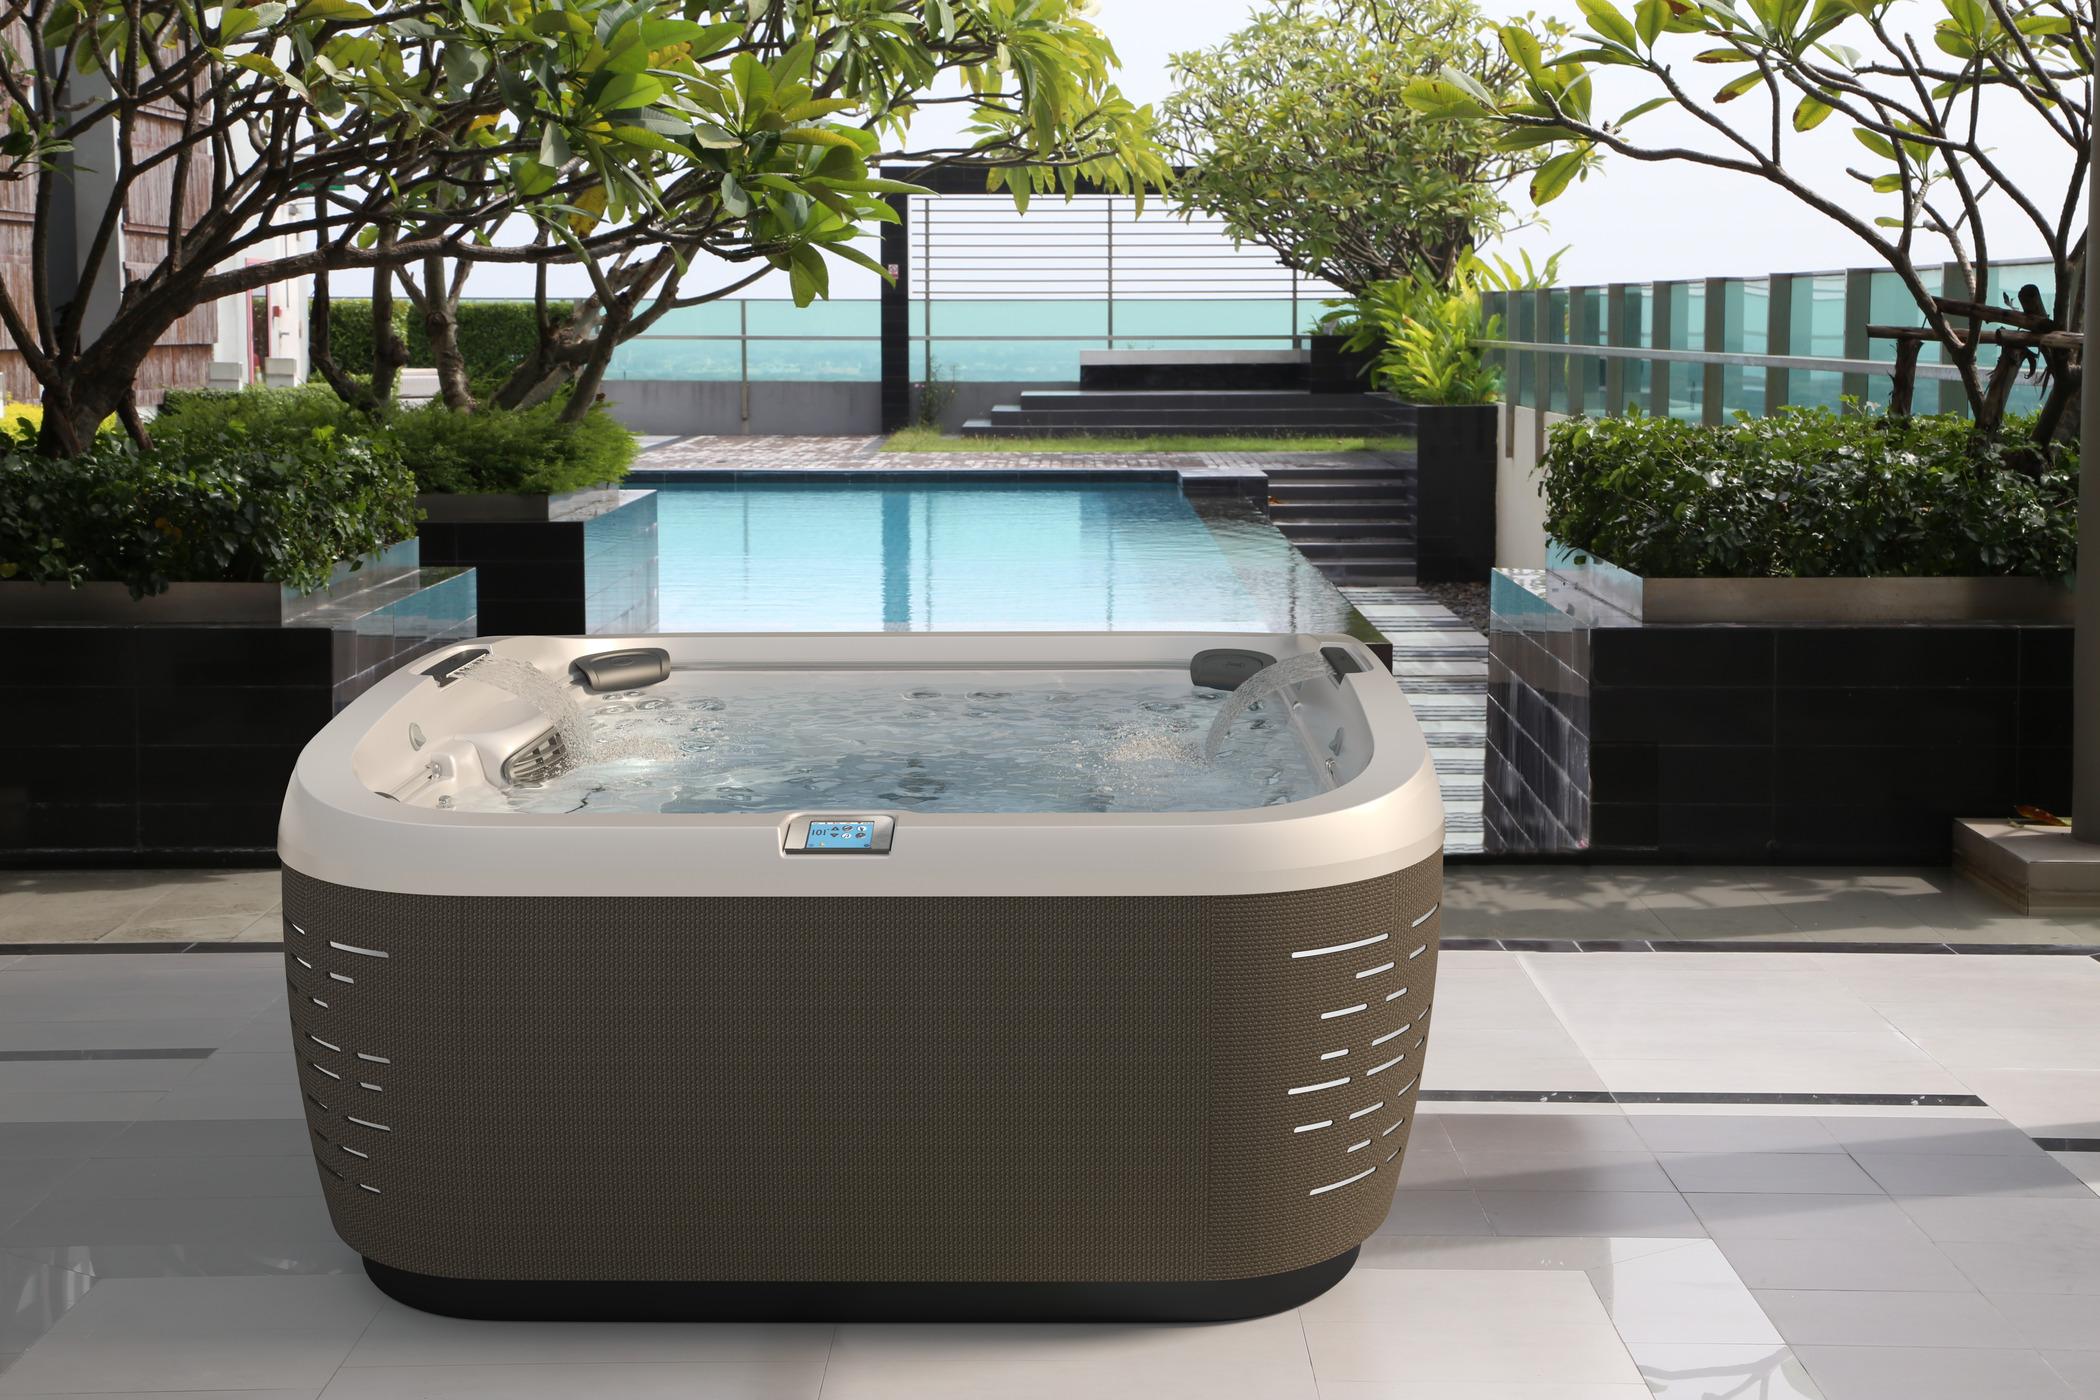 J-500 series hot tub installation in Ocala Florida